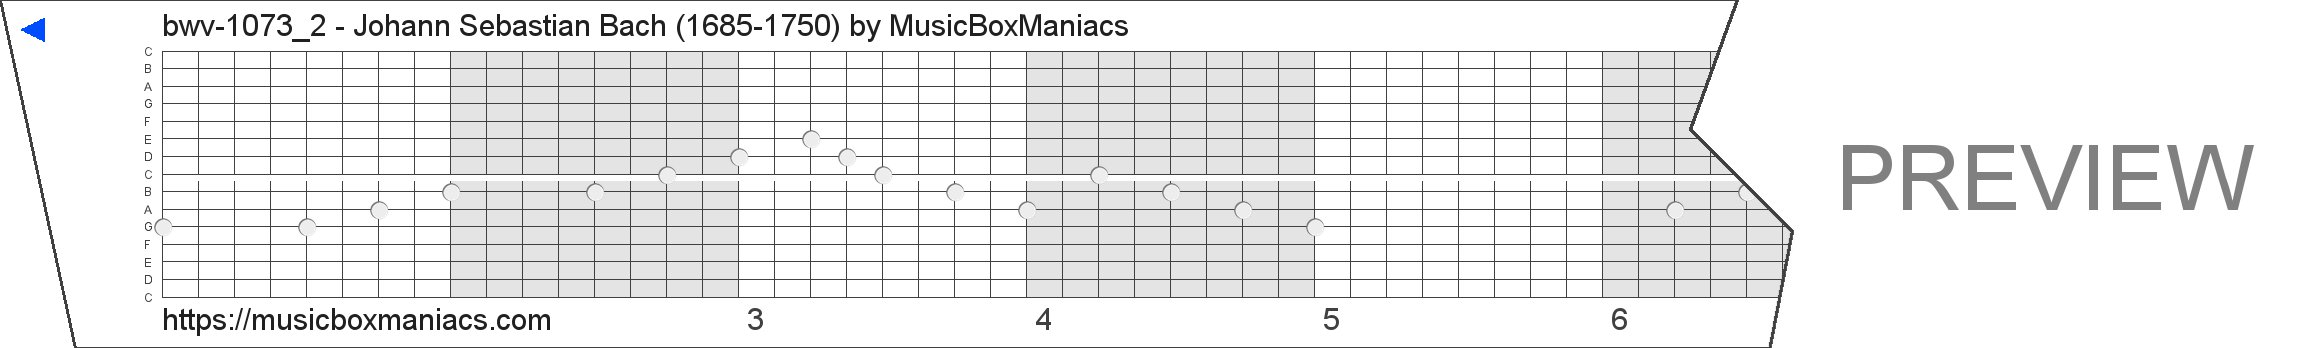 bwv-1073_2 - Johann Sebastian Bach (1685-1750) 15 note music box paper strip